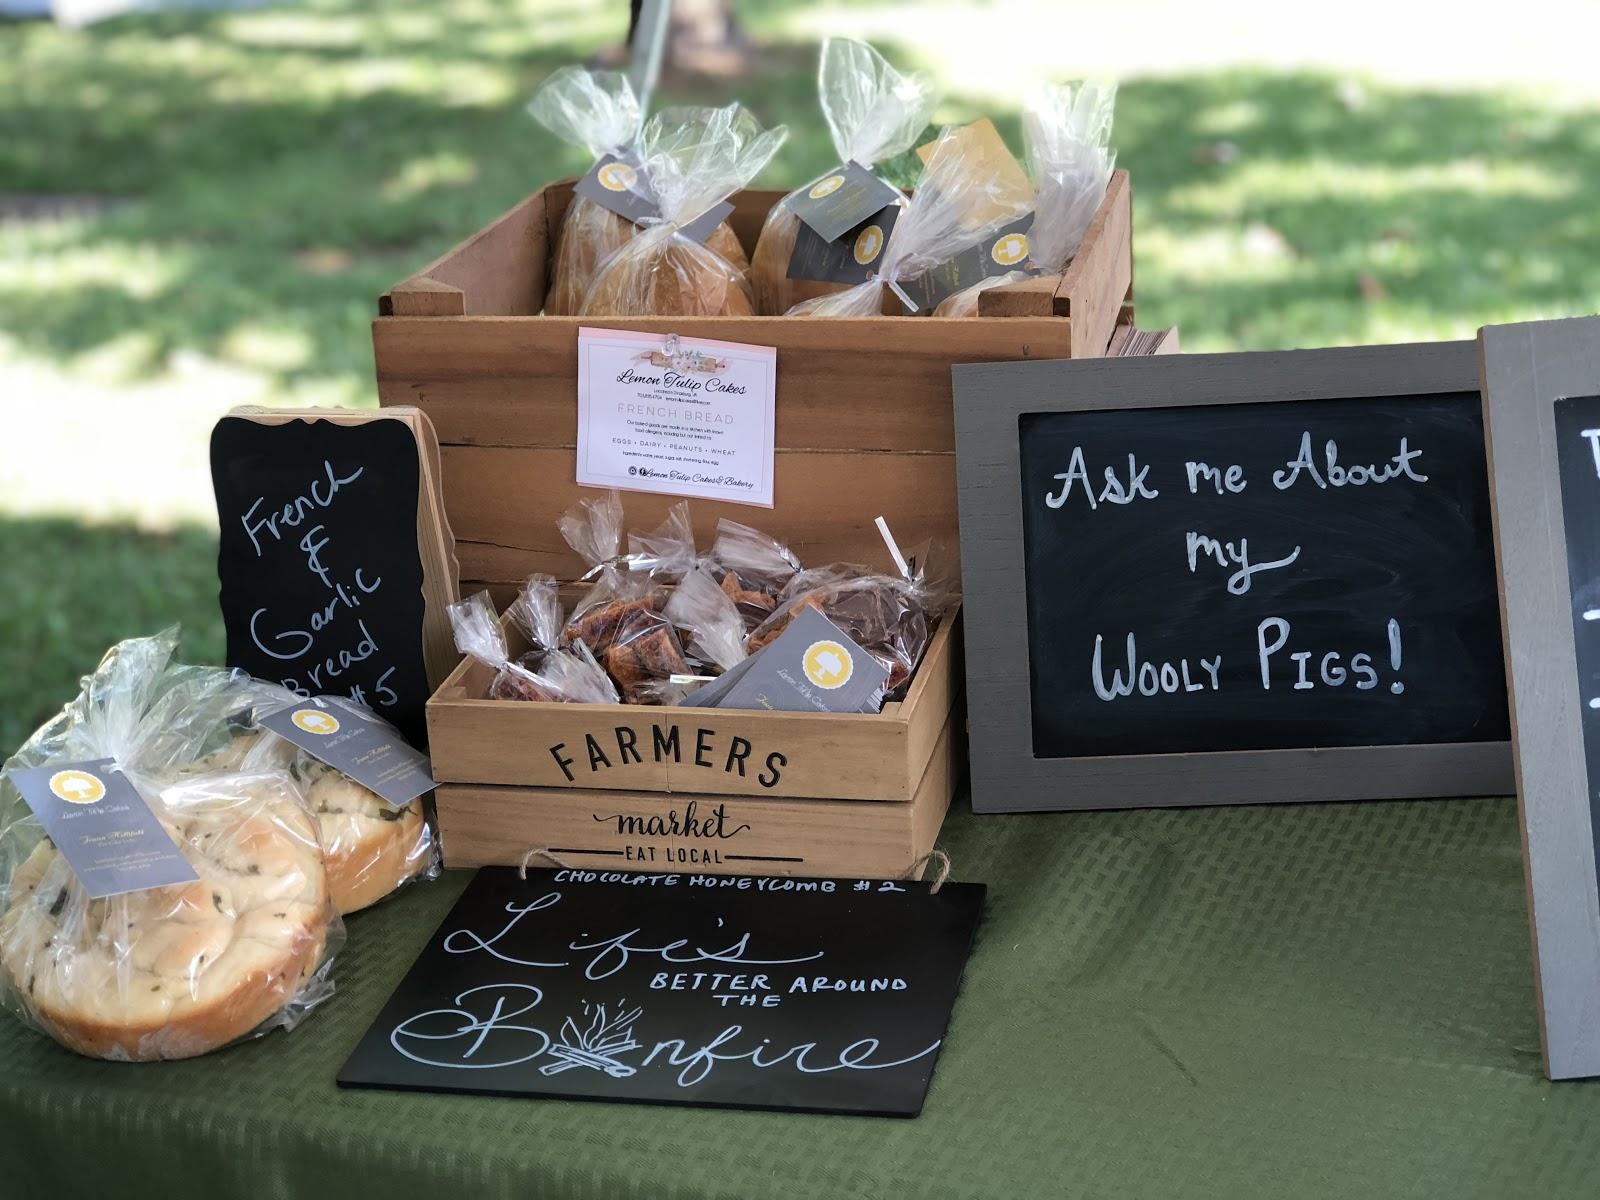 Farmer's Market Set Up